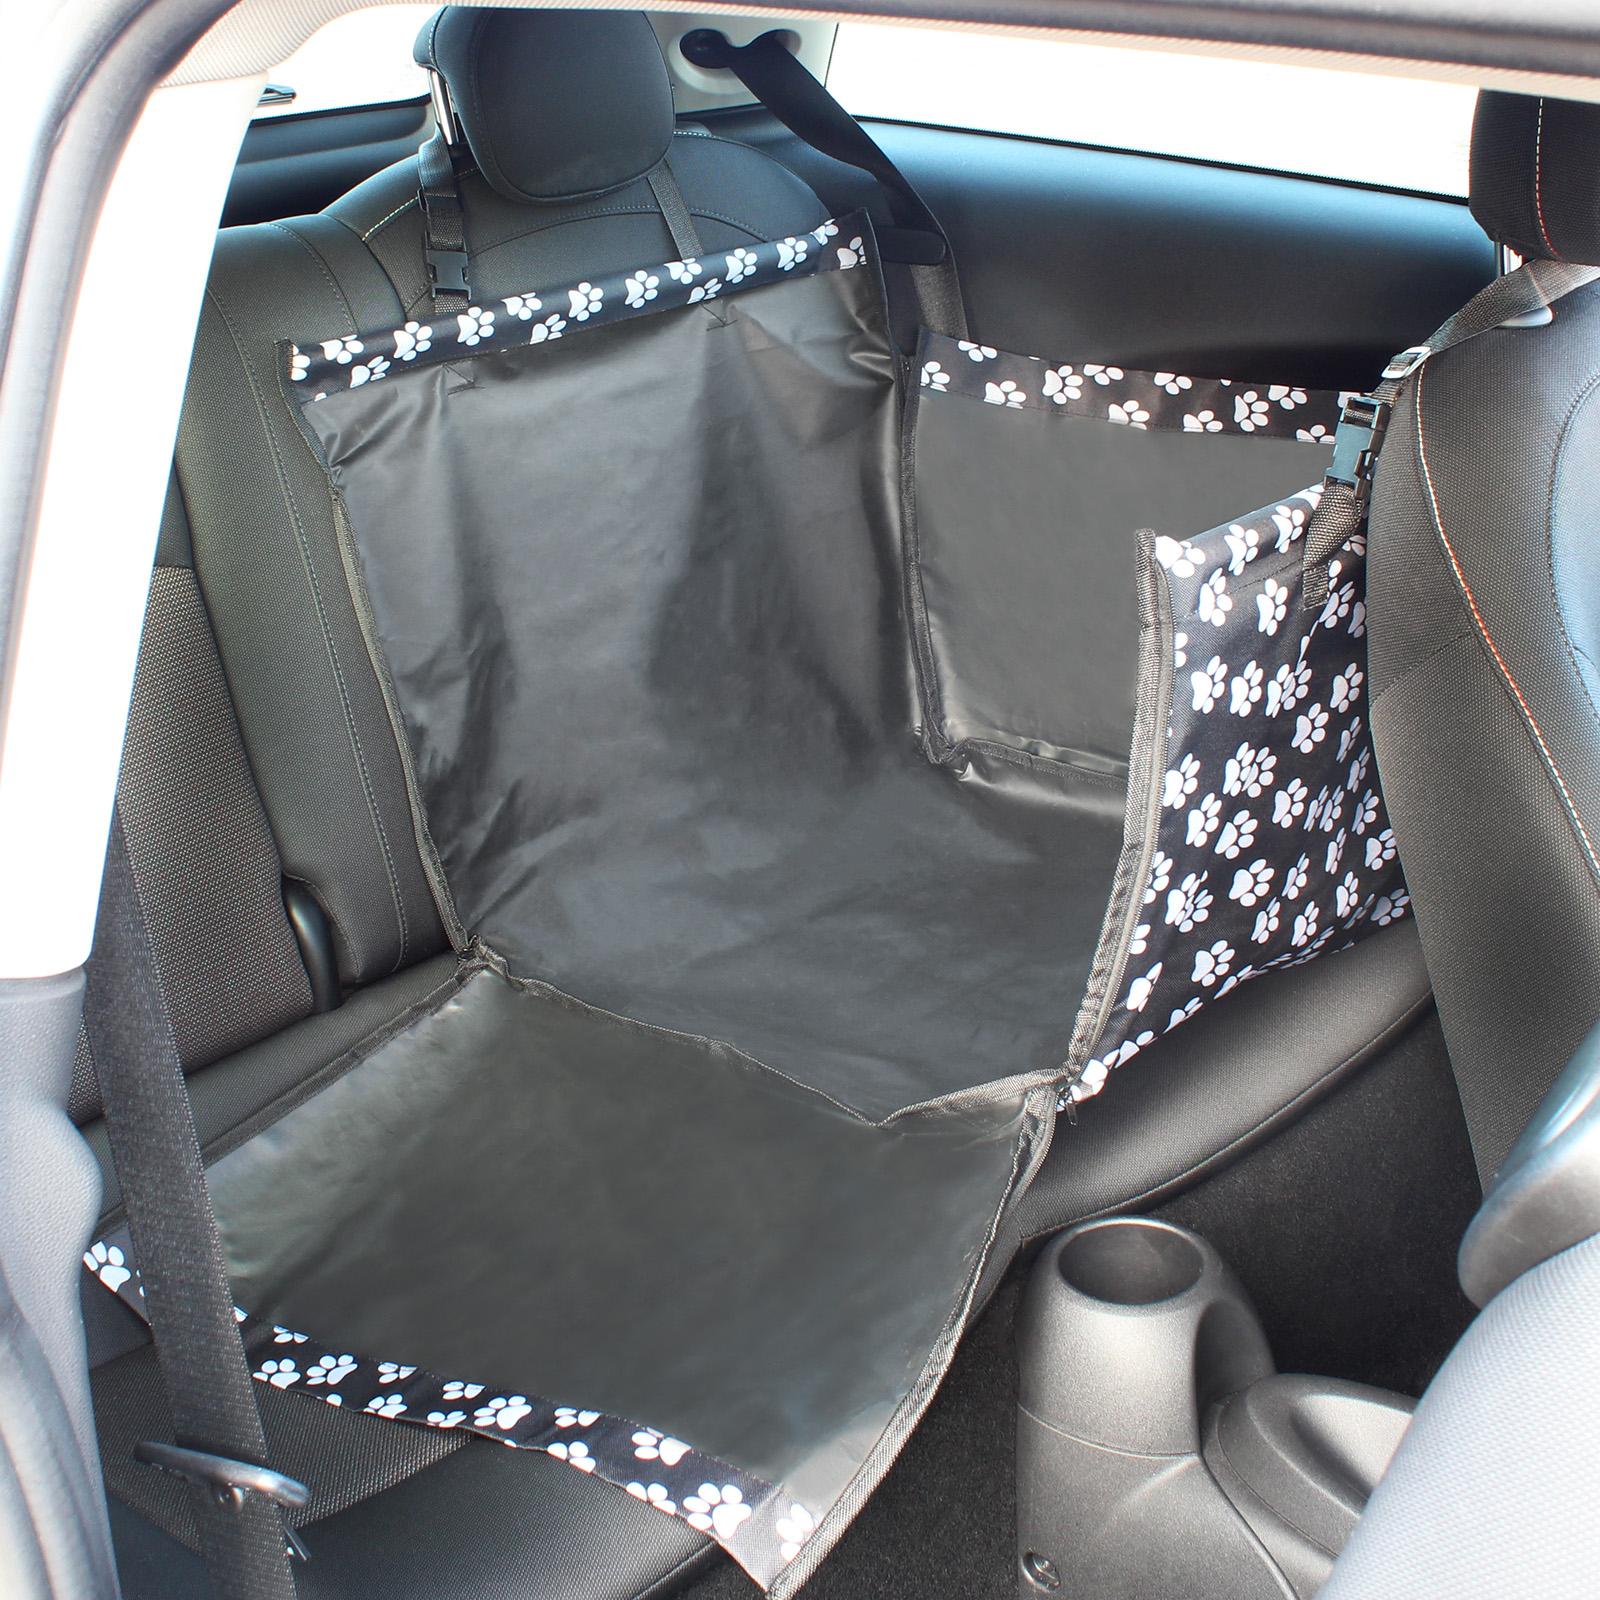 ME & MY SMALL REAR WATERPROOF CAR SEAT LINER/PROTECTOR HAMMOCK PET